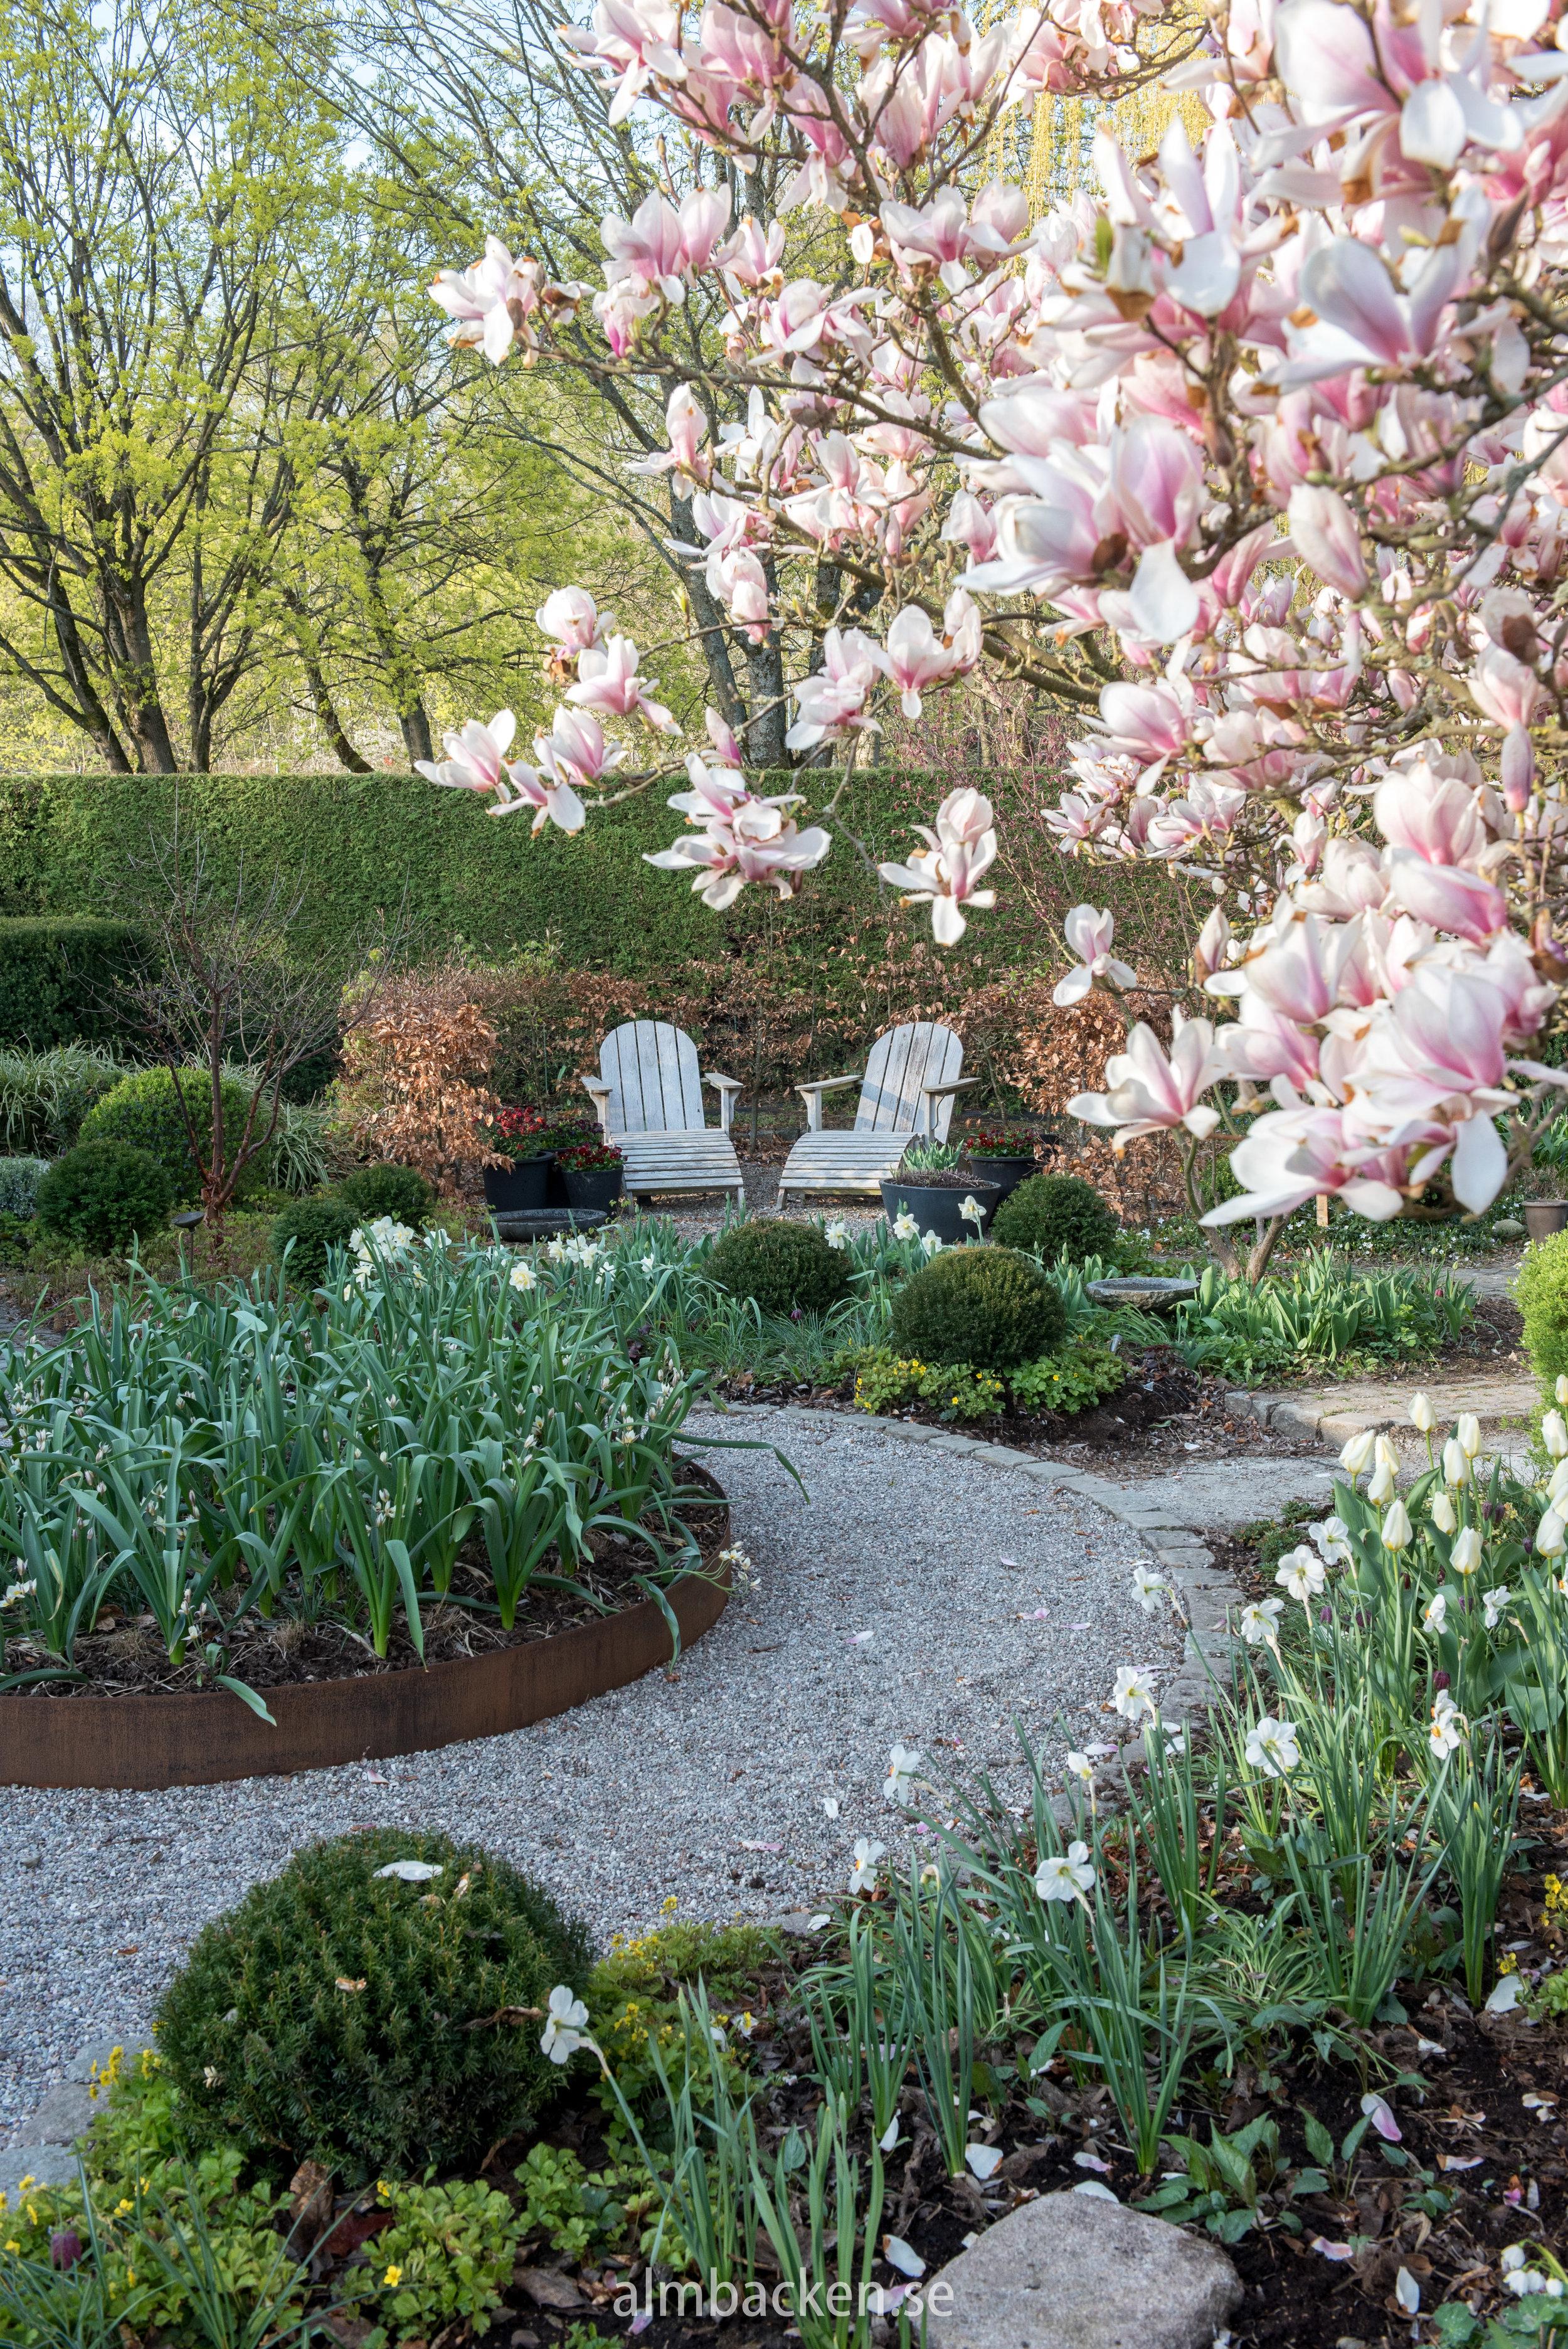 magnolia-soulangeana-almbacken-tradgardsdesignjpg